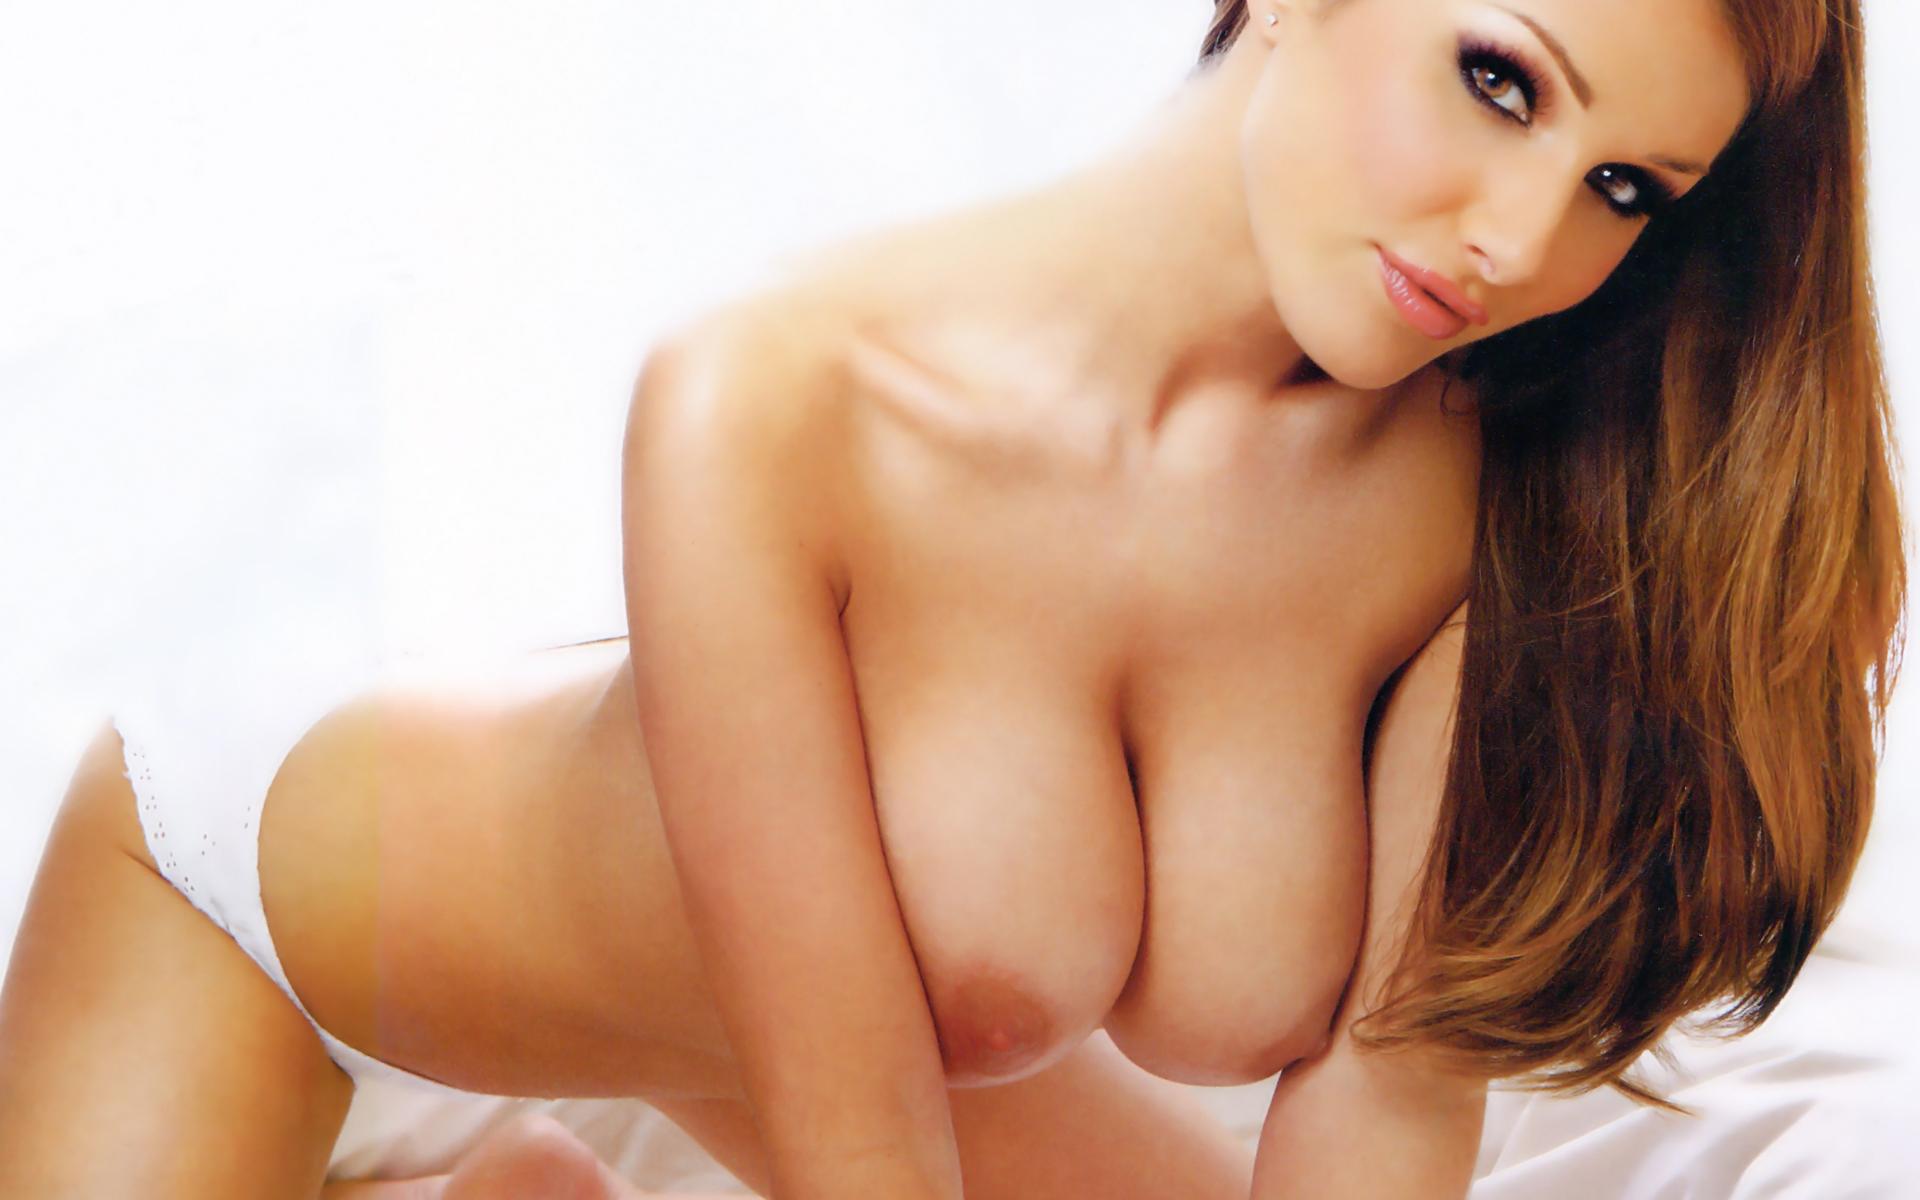 Celebnakedness Lucy Pinder Big Bare Breasts Nude Photoshoot Tnaflix Porn Pics